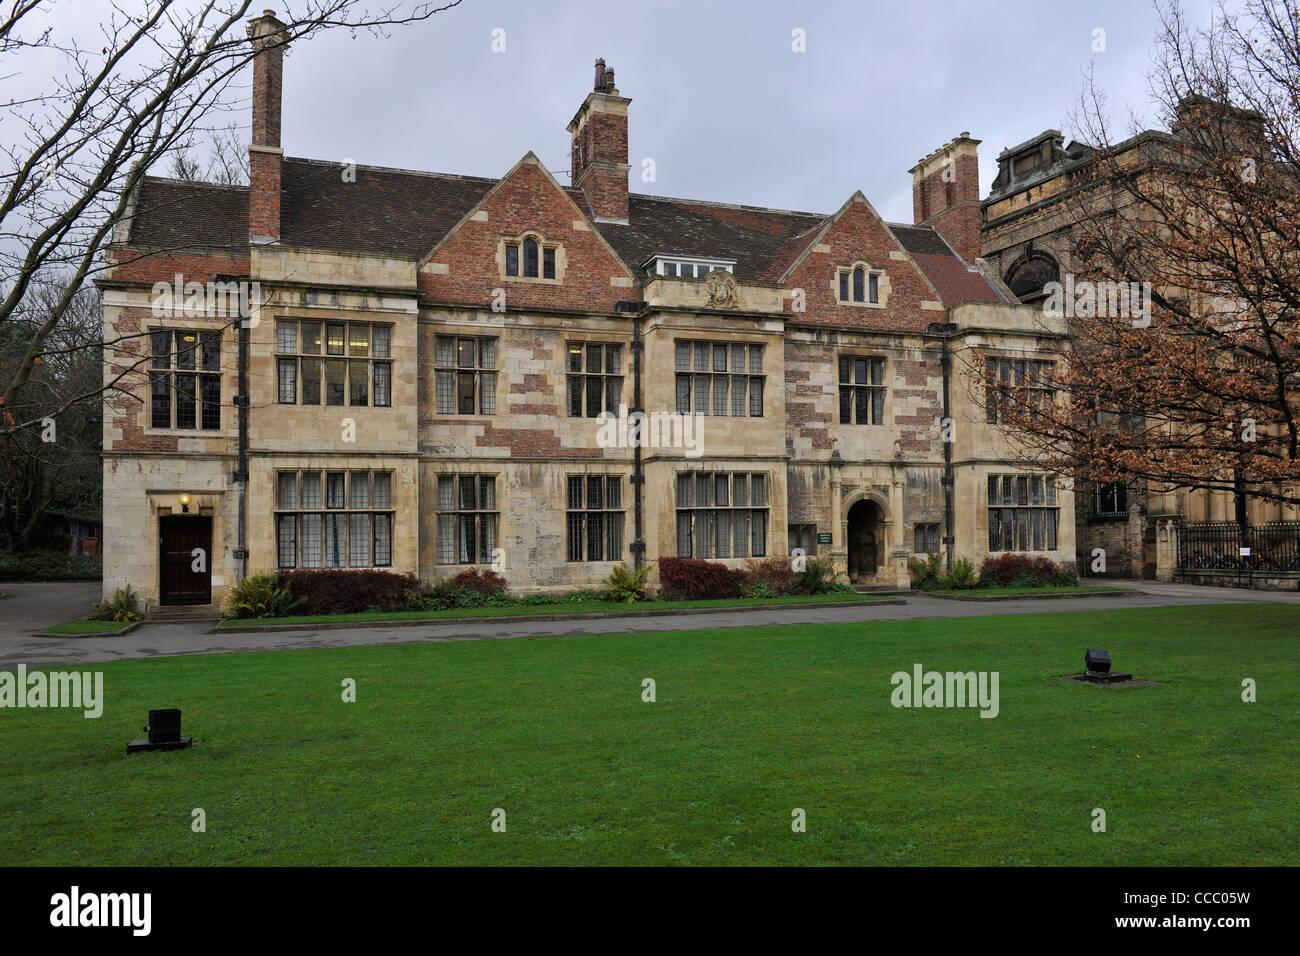 The King's Manor, York-1 - Stock Image